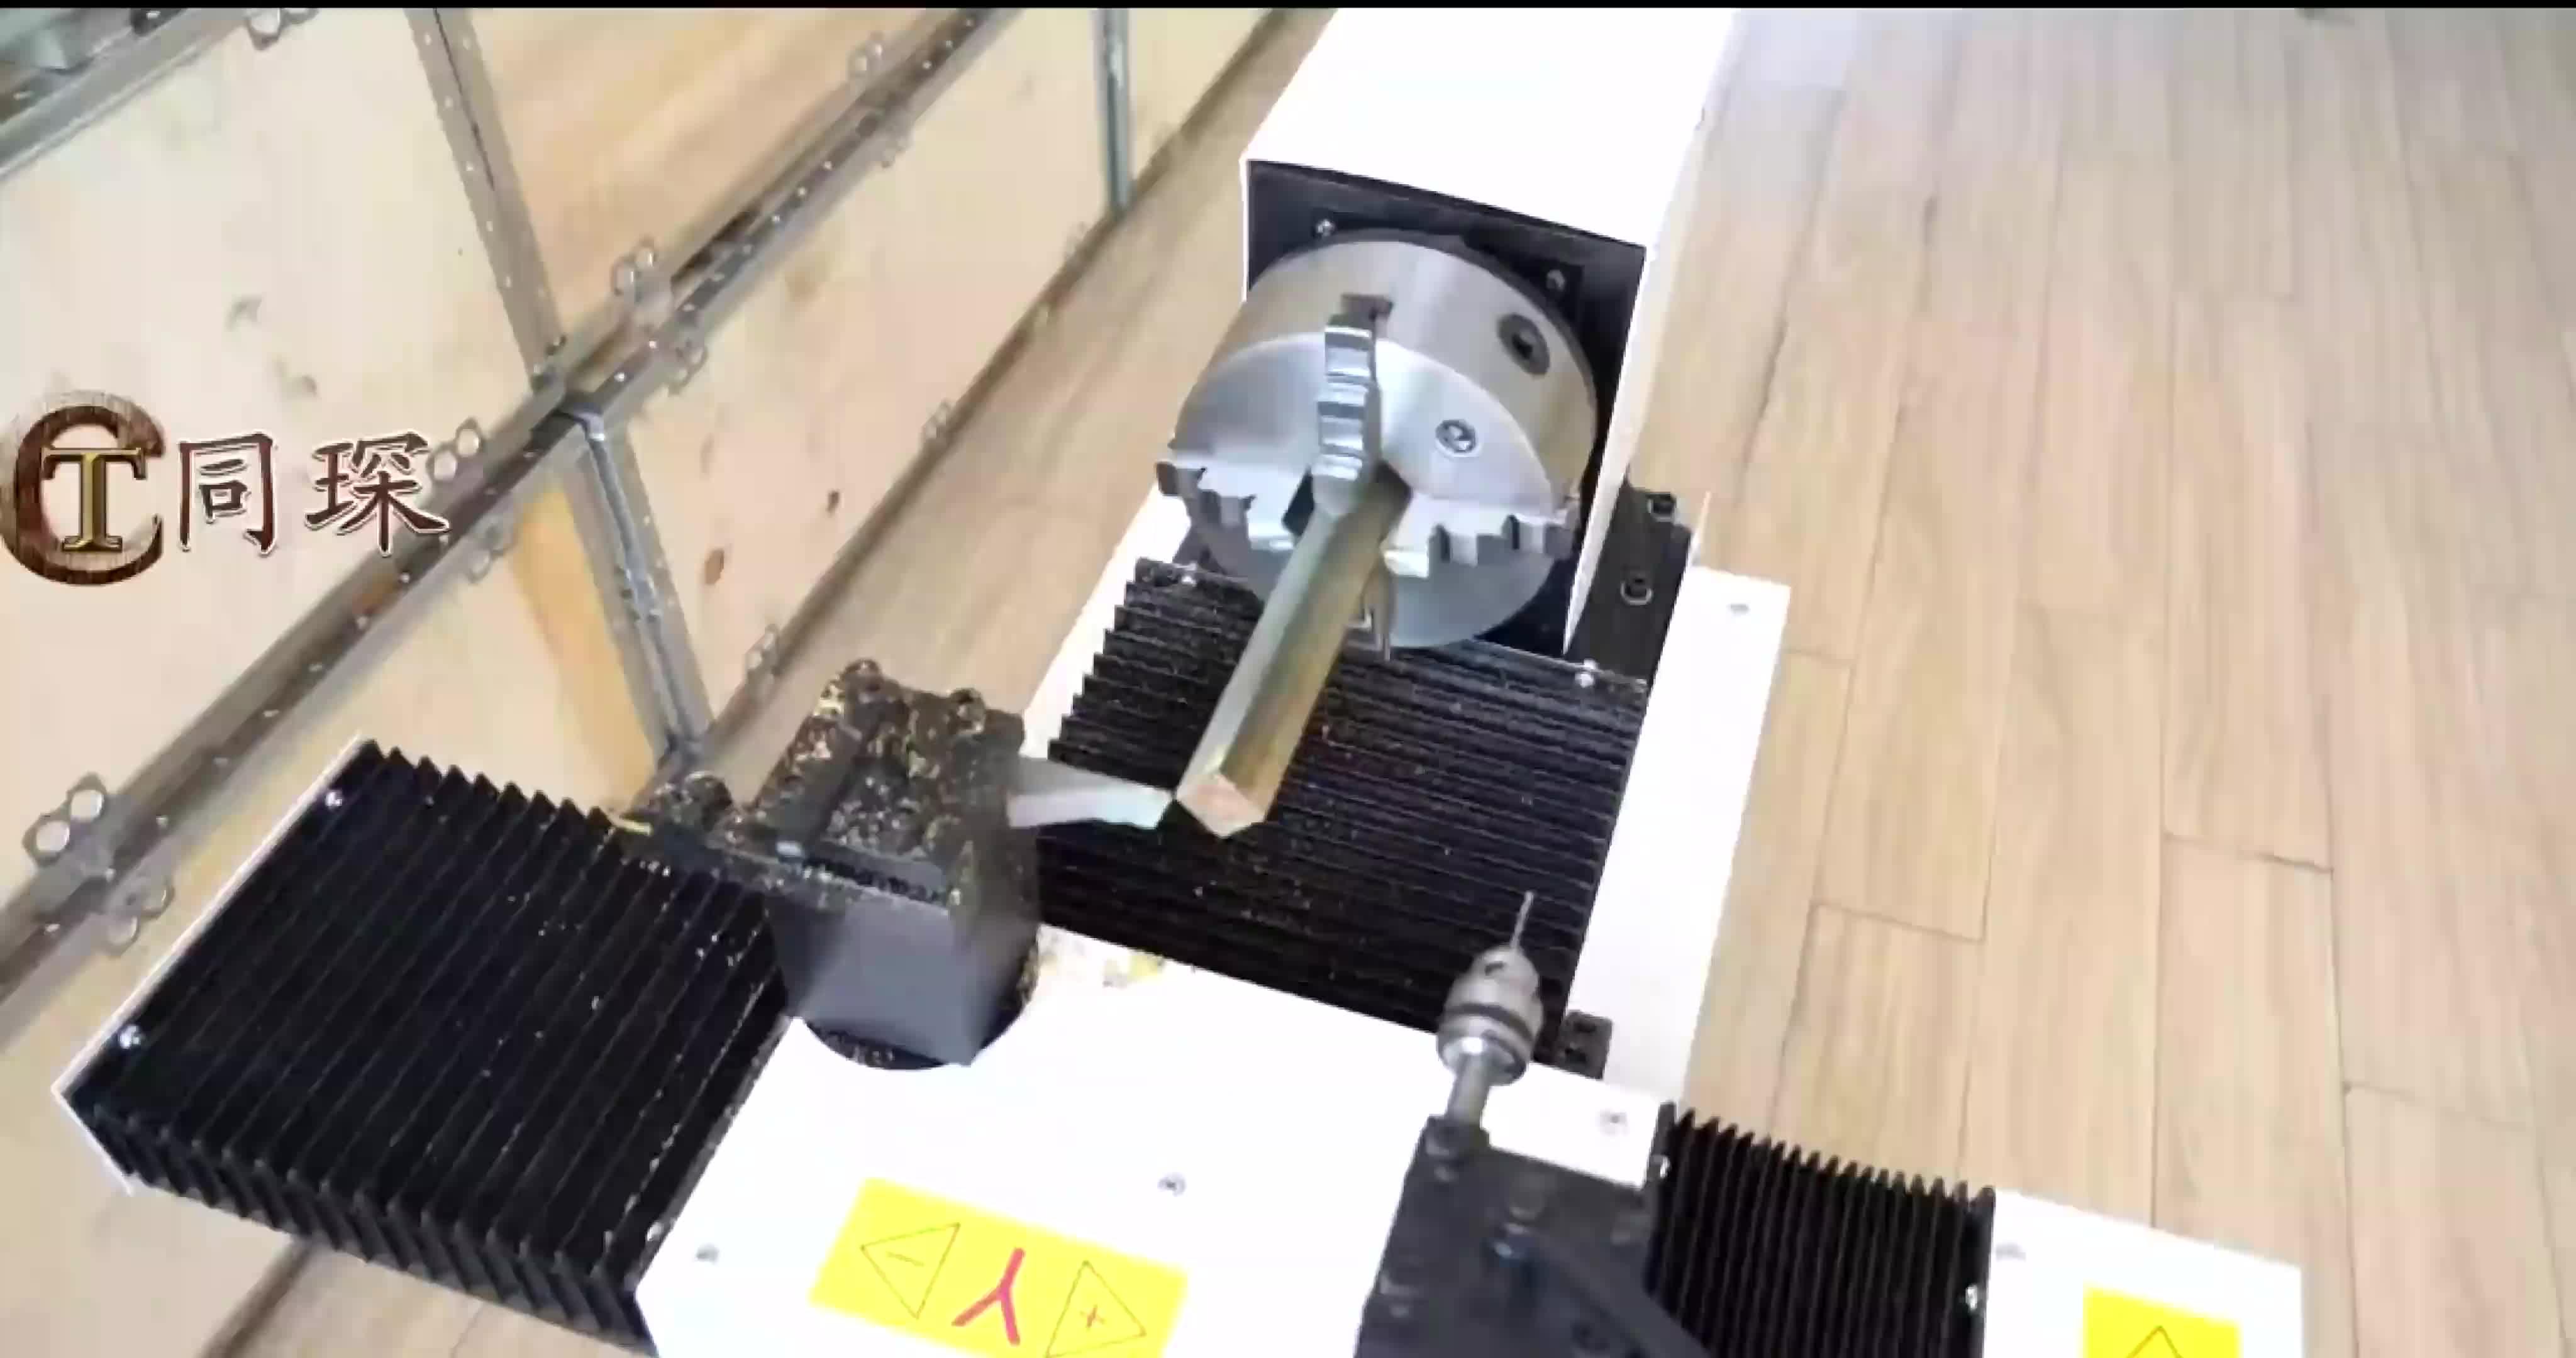 A16 Four-Axis มินิ CNC เครื่องกลึงเปลี่ยนราคา